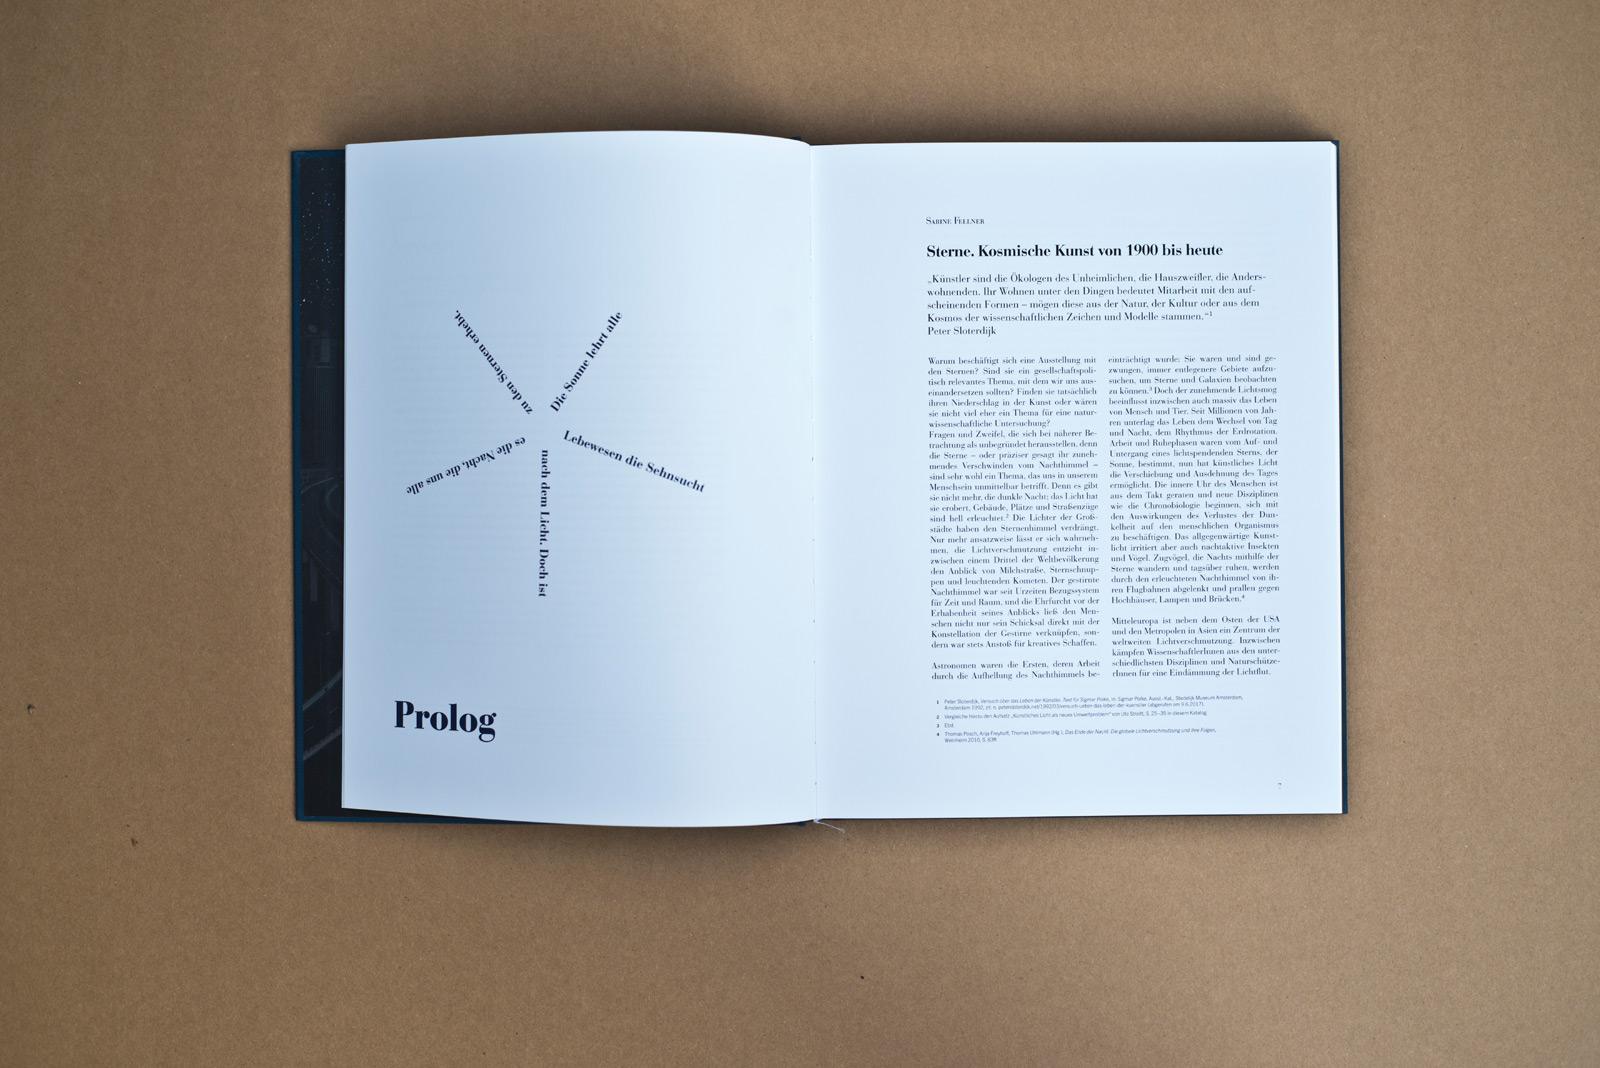 Sterne – Kosmische Kunst von 1900 bis heute – Katalog – LENTOS Kunstmuseum Linz © Martin Bruner Sombrero Design